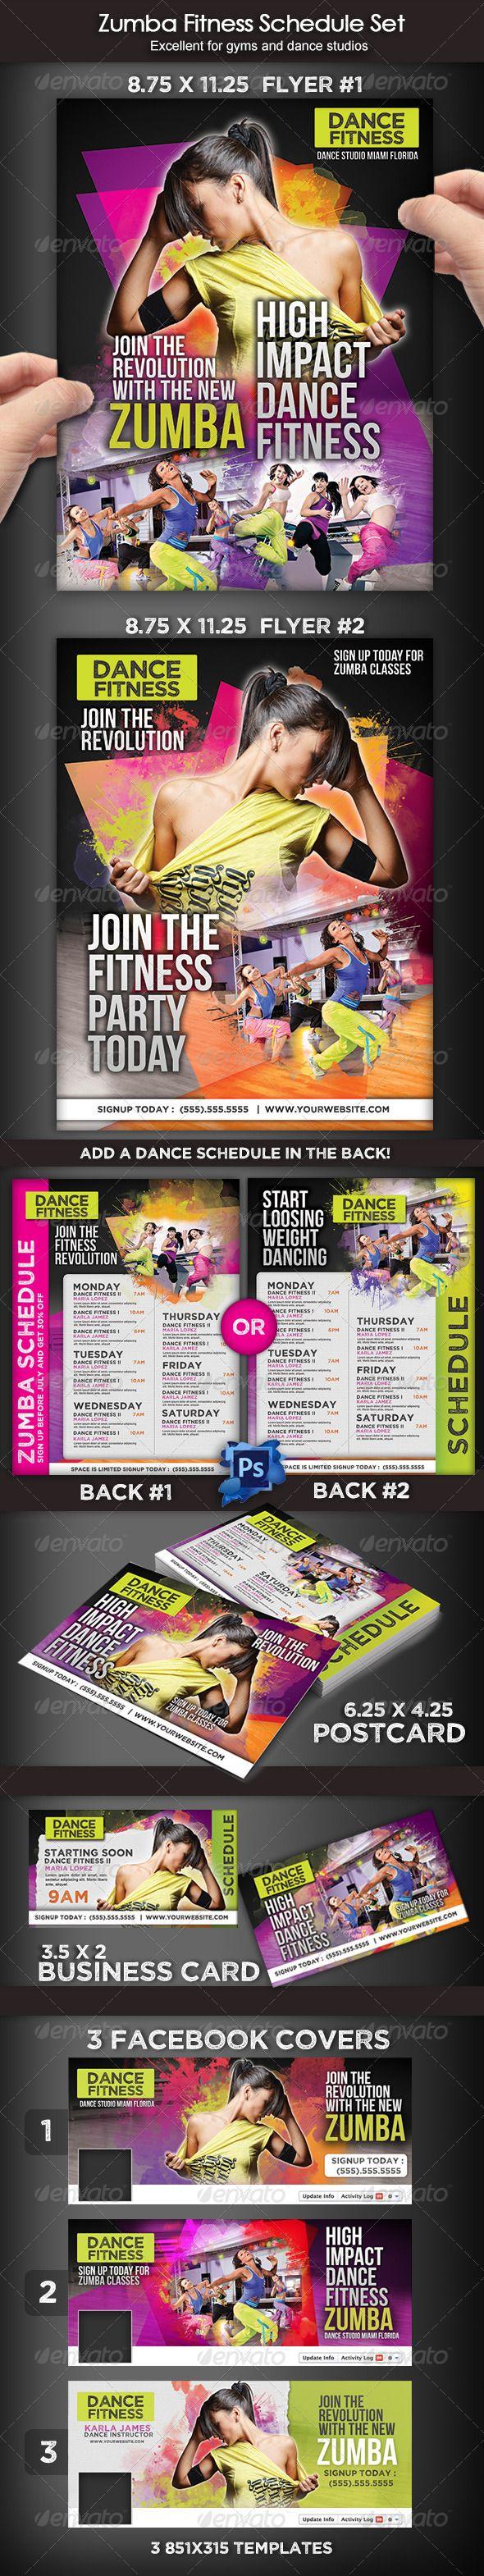 Zumba Dance Fitness Set